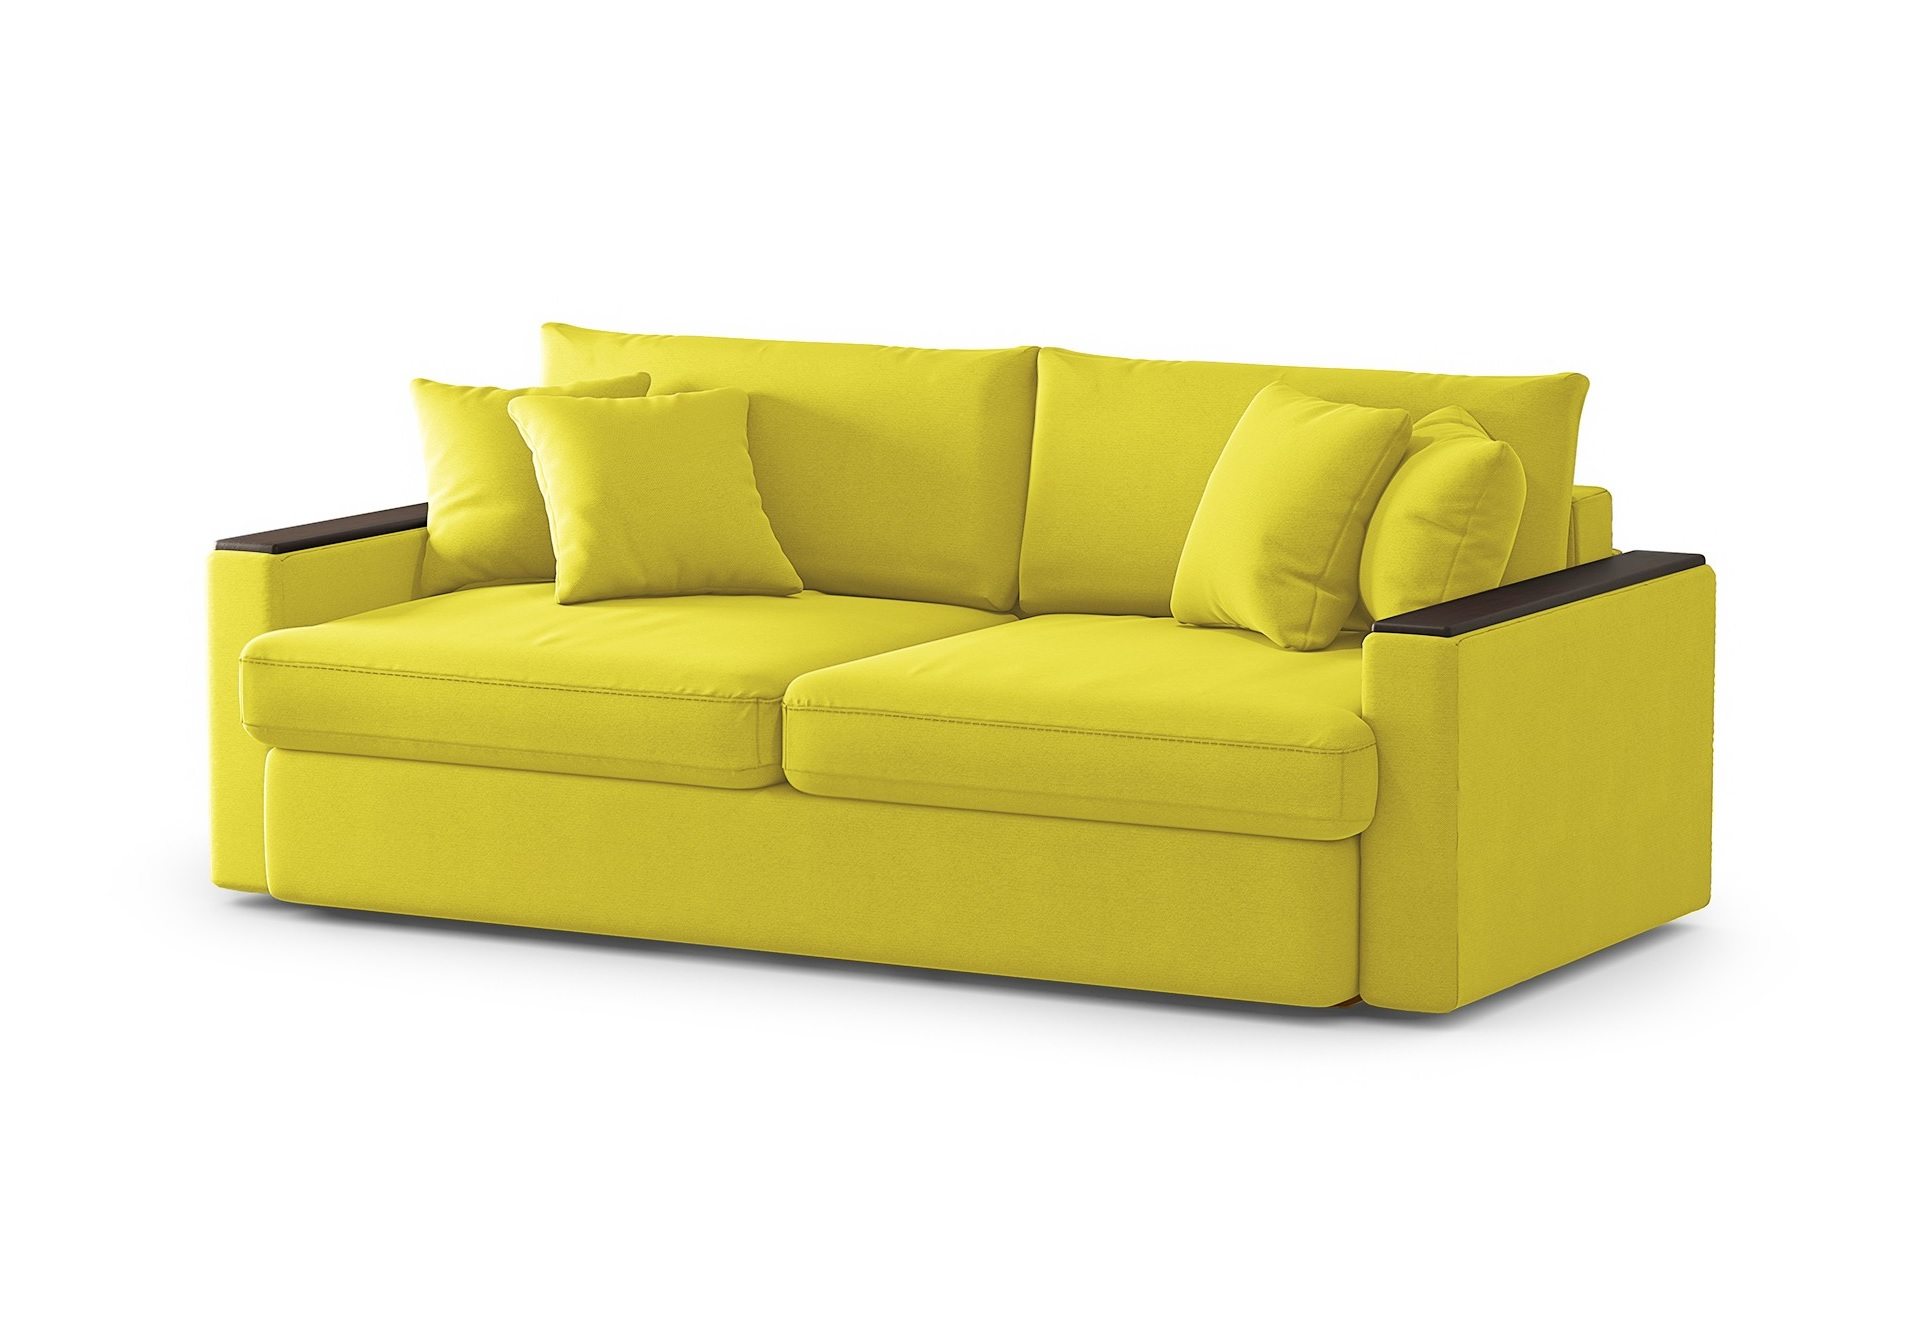 Диван стелф (fiesta) желтый 224x90x109 см.